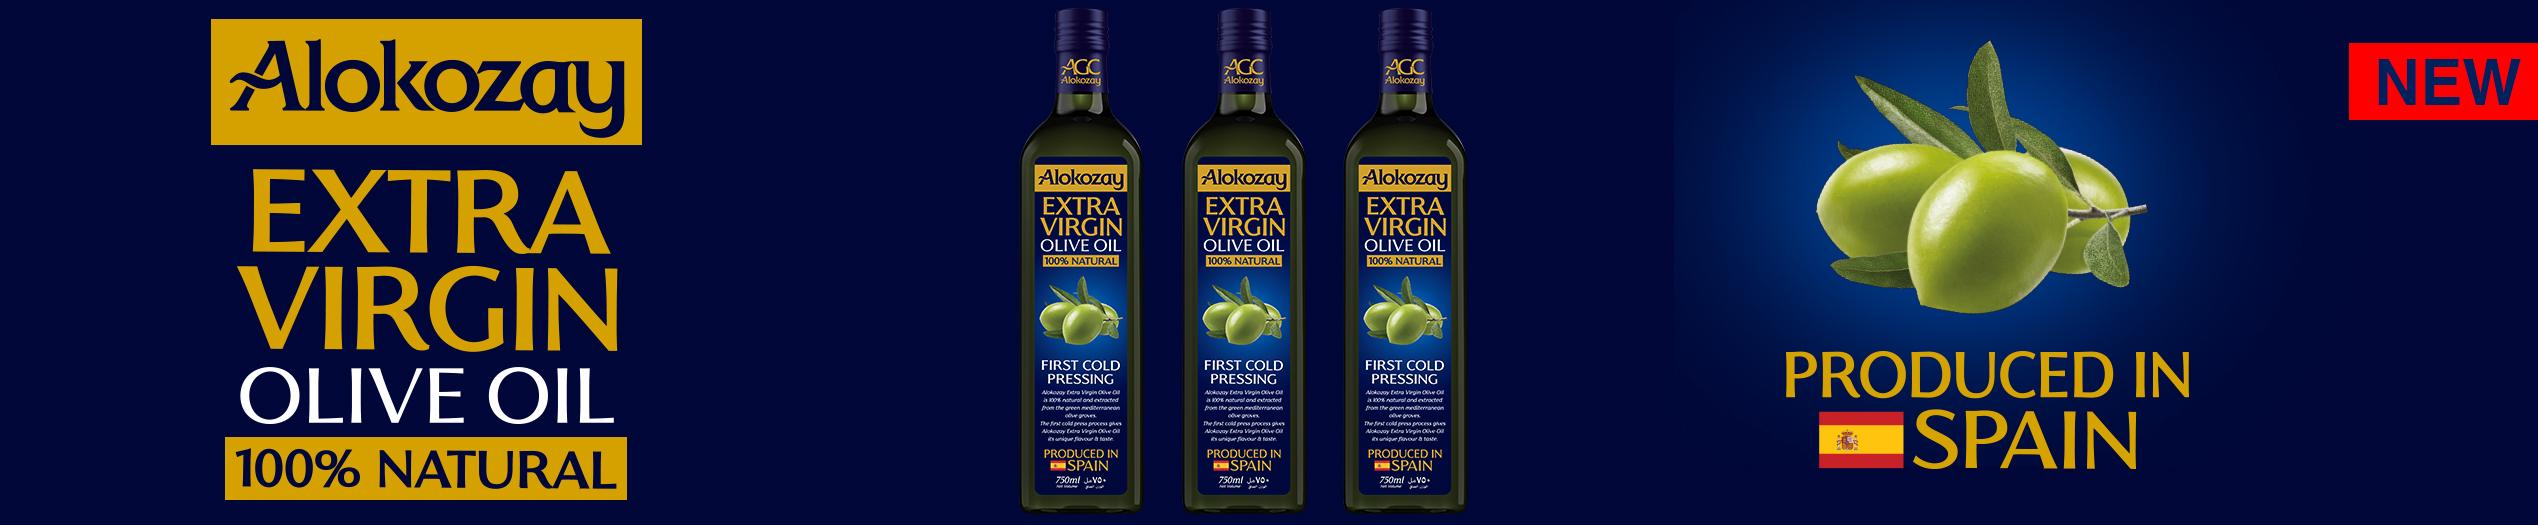 Extra Virgin Olive Oil uae